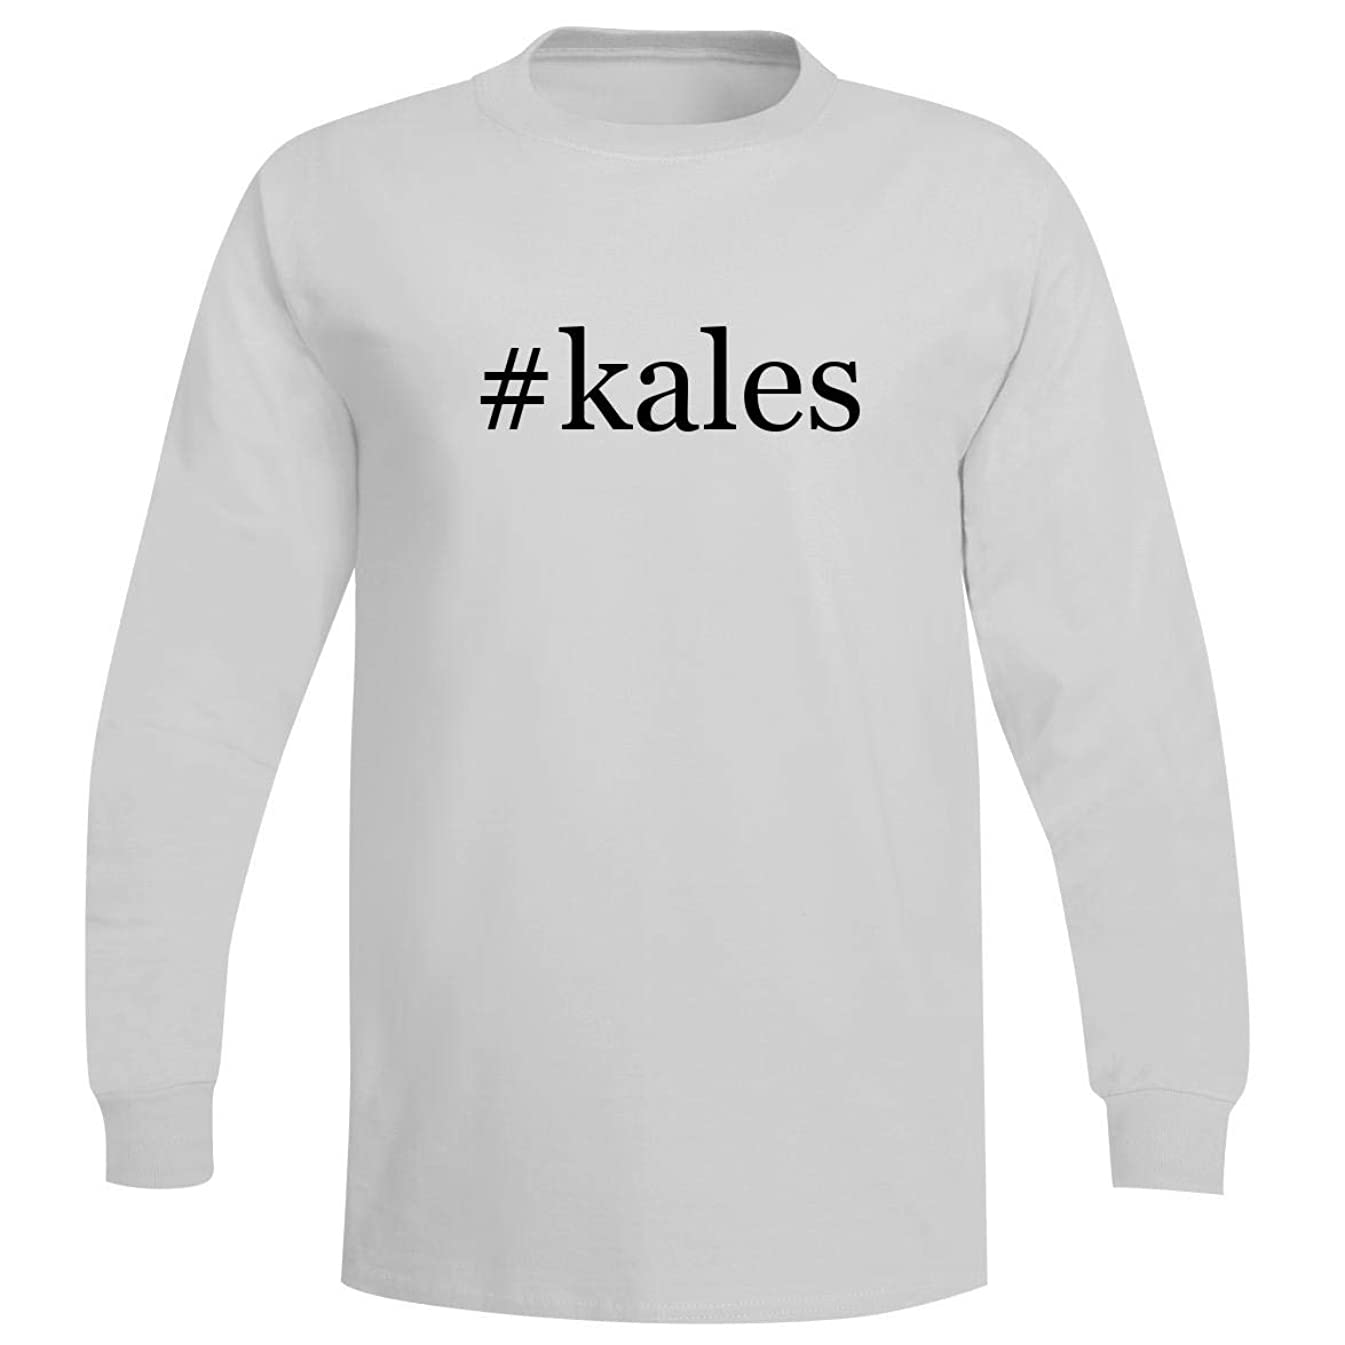 The Town Butler #Kales - A Soft & Comfortable Hashtag Men's Long Sleeve T-Shirt